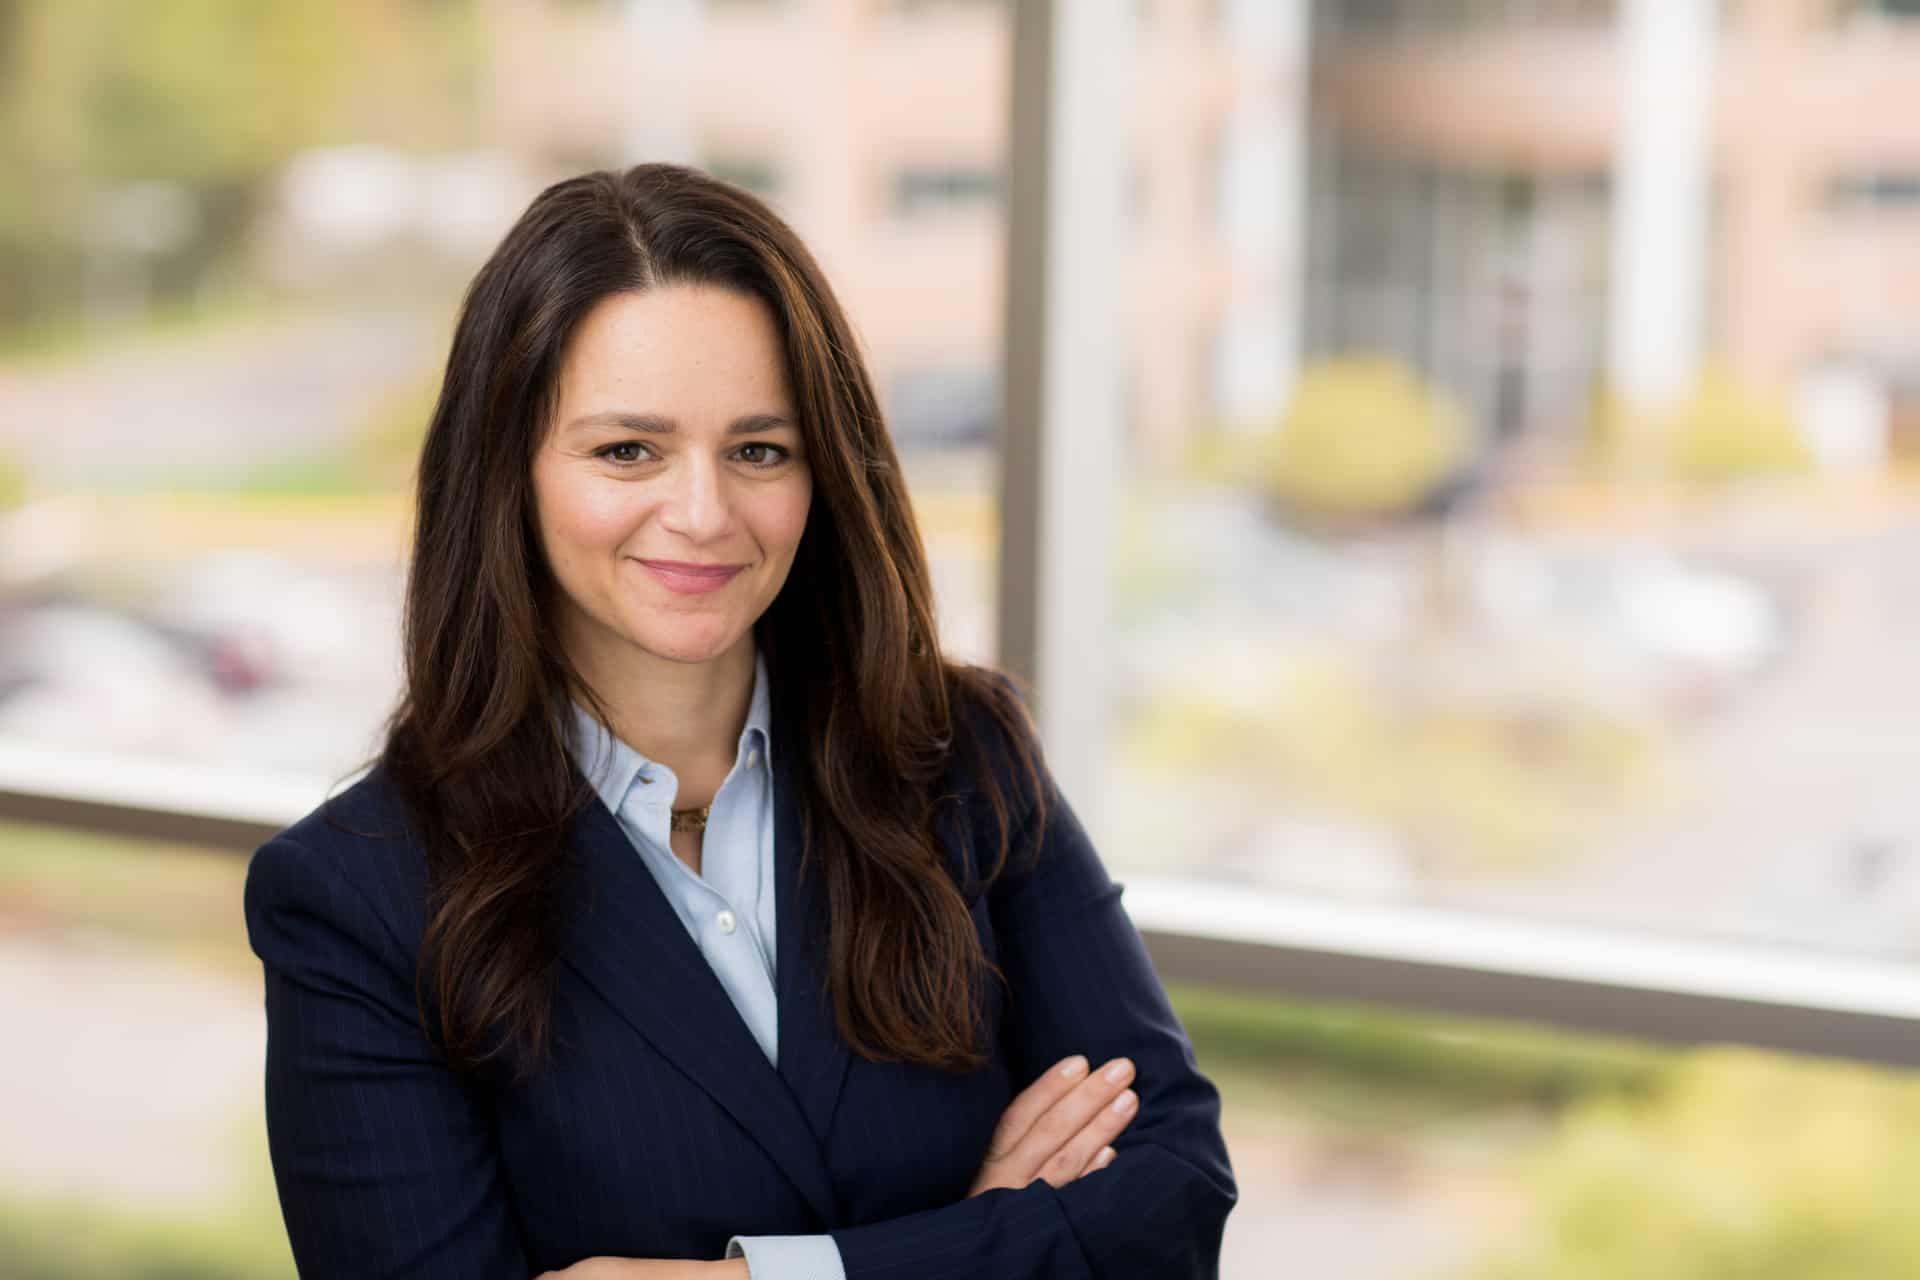 Daniella Gordon Speaks at 2019 Atlantic Builders Convention